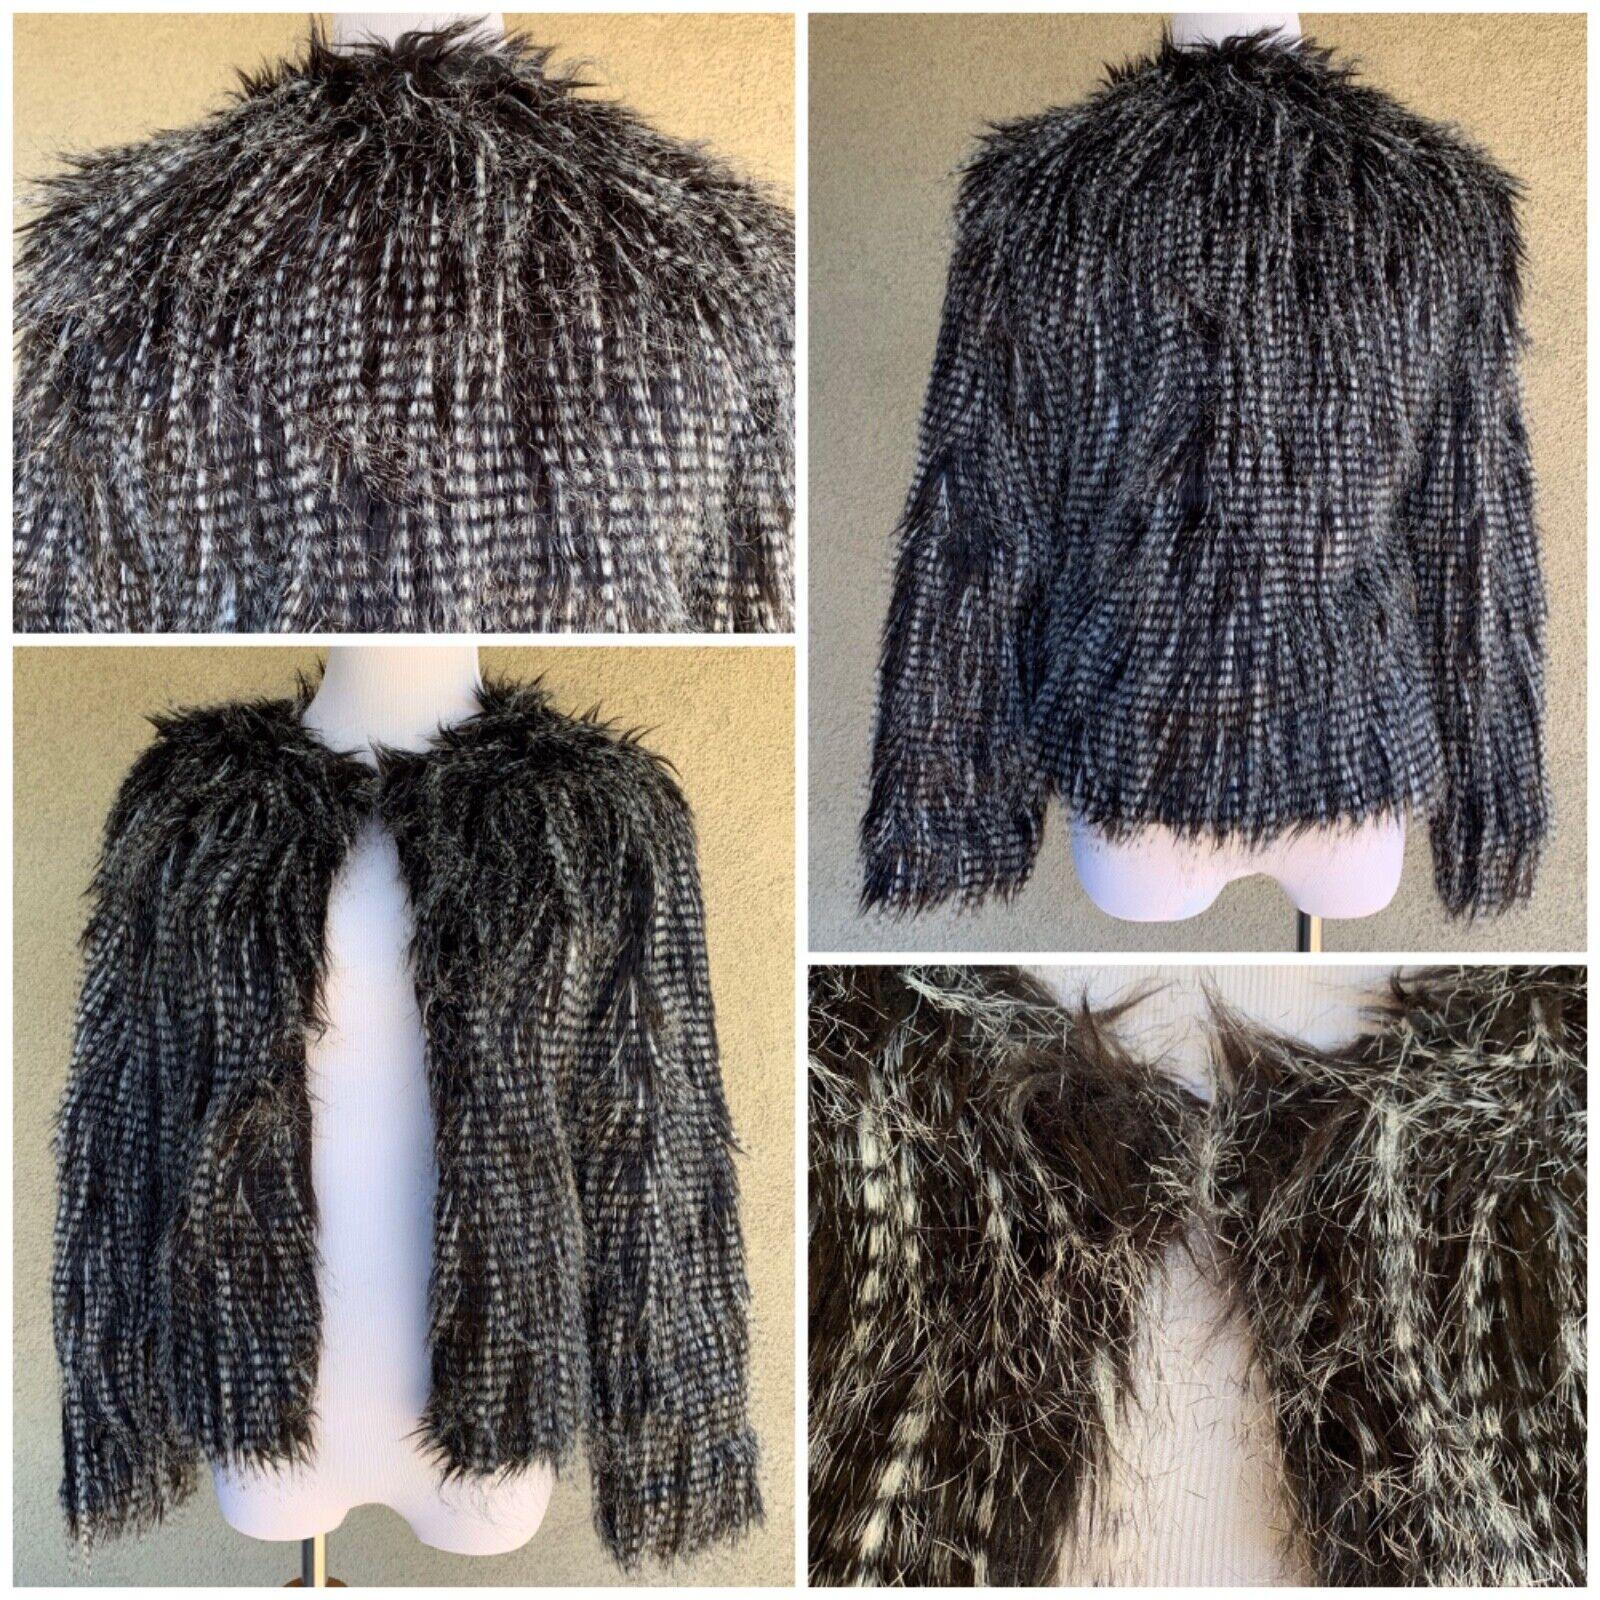 """Haoduoyi"" Feathery Faux Fur Jacket Coat B&W 70s Retro XS"